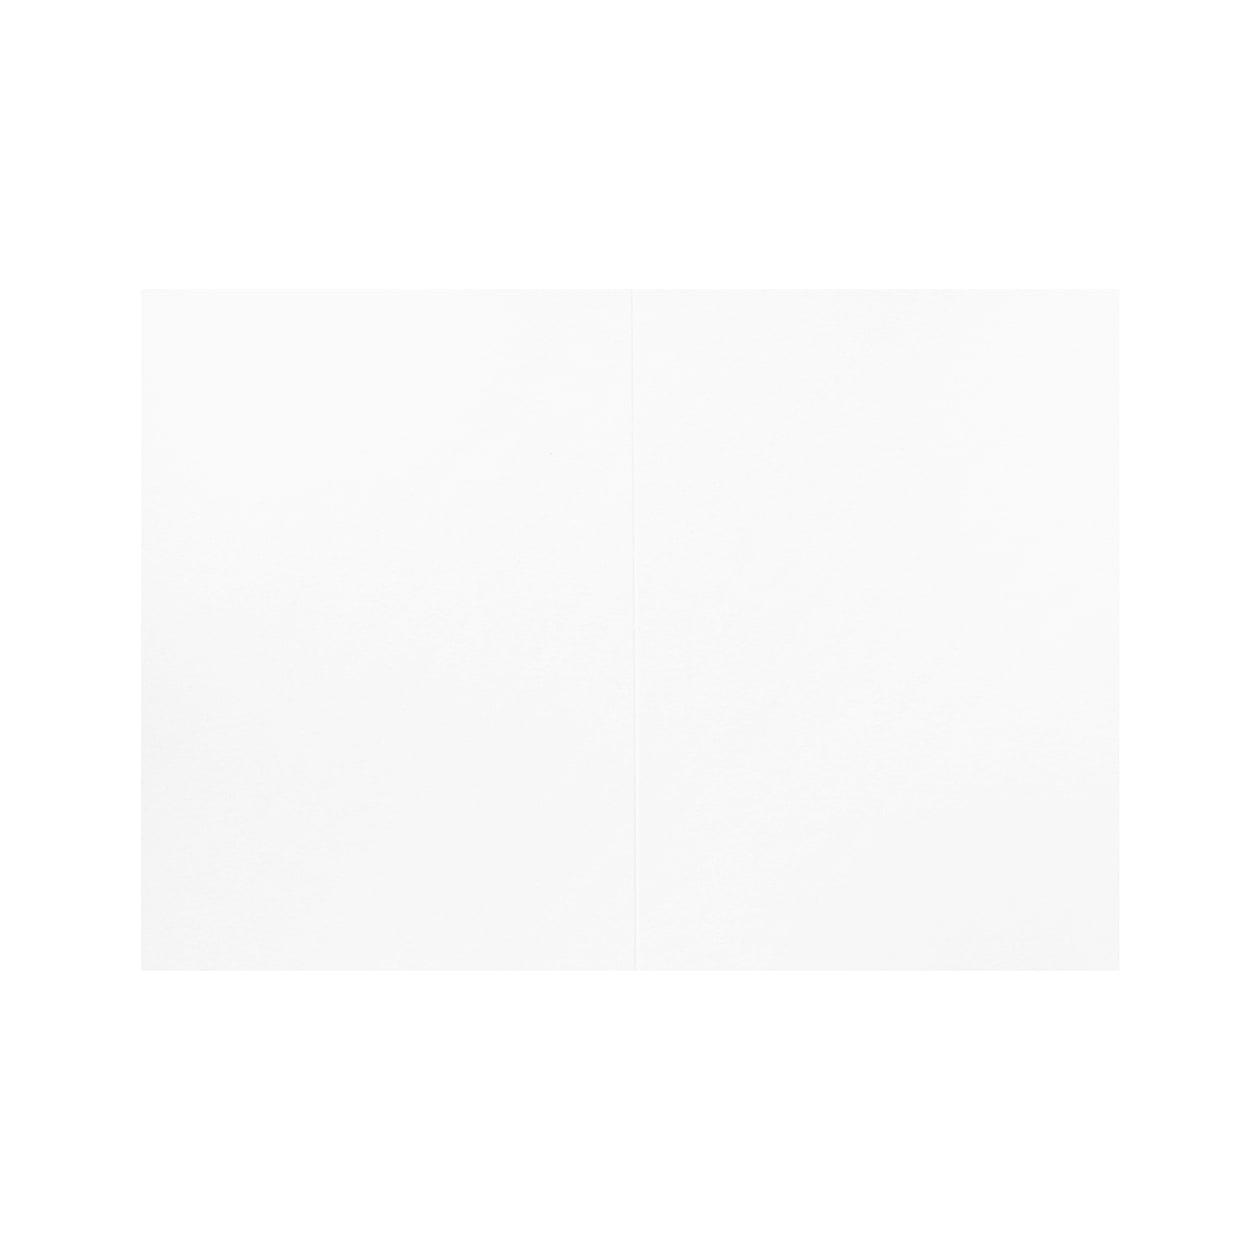 A4カバー コットン スノーホワイト 232.8g